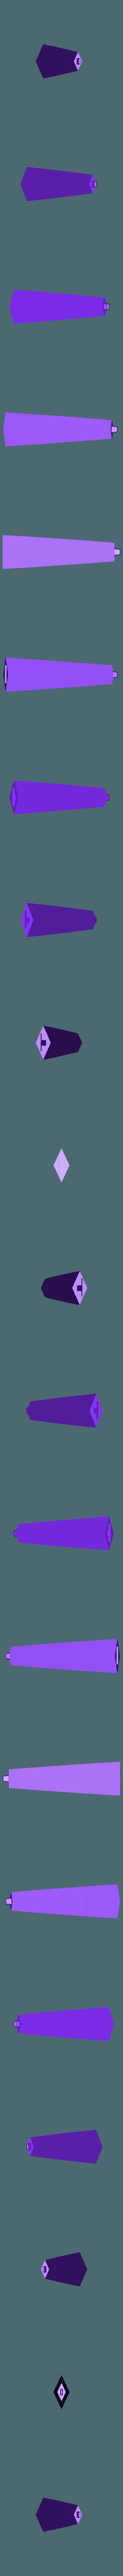 Small_Volume_4.stl Download free STL file V for Vendetta Dagger New and Improved • 3D printer model, stensethjeremy